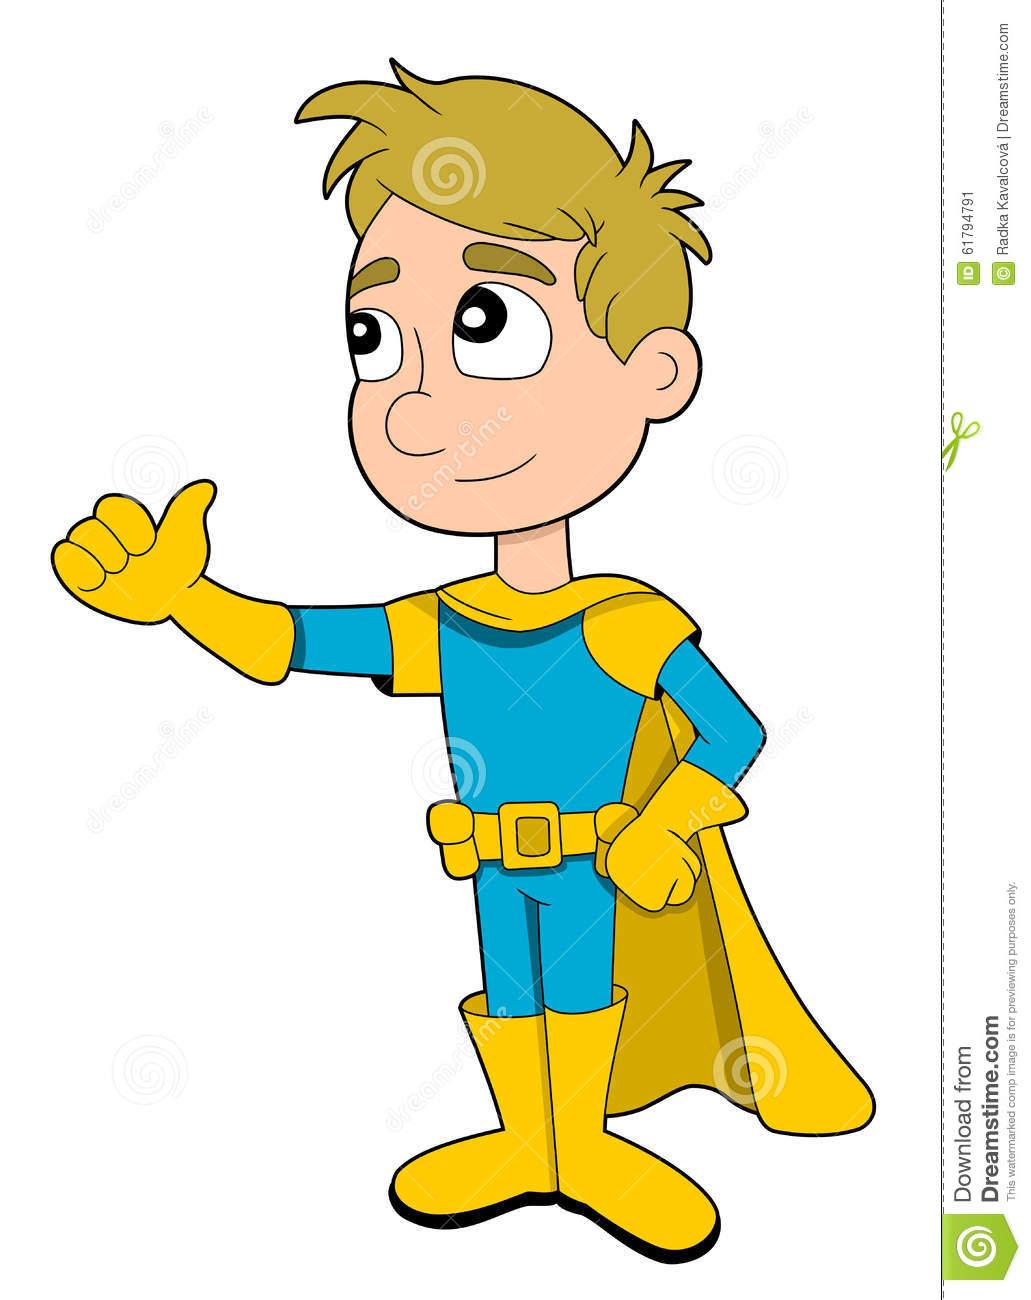 Little boy giving thumbs up clipart clipart stock Superhero Boy Cartoon Stock Vector - Image: 61794791 clipart stock